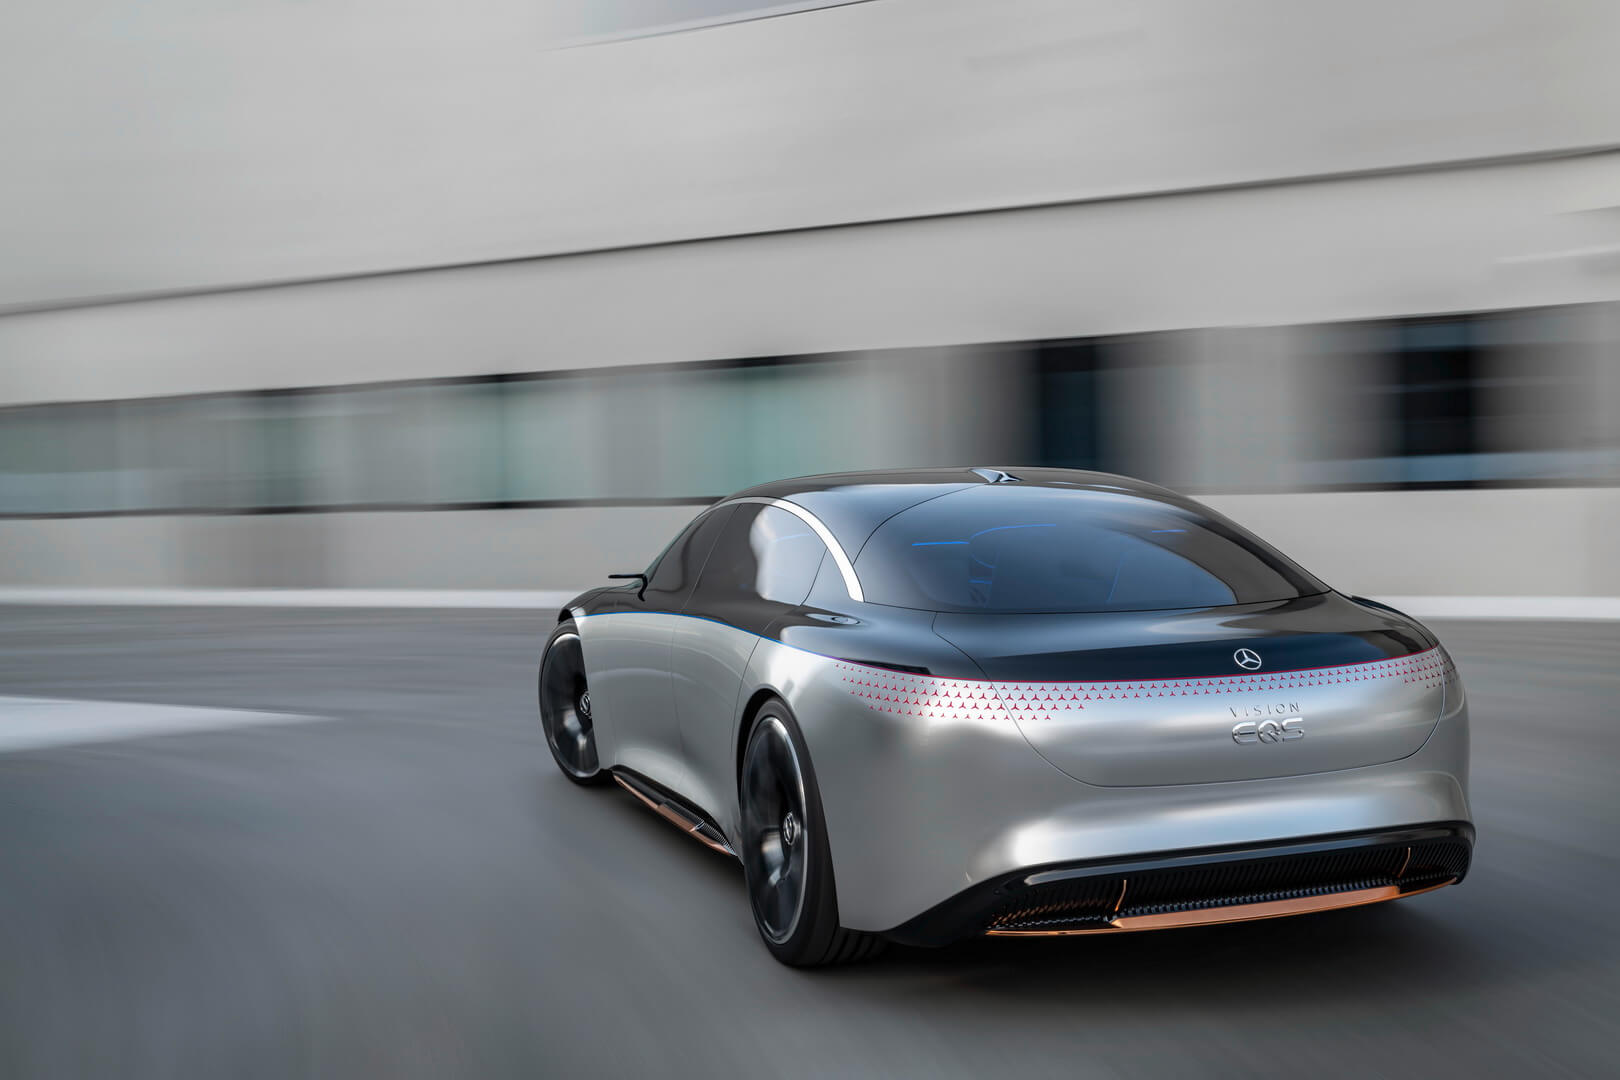 Mercedes-Benz VISION EQS: концепт электрического седана с запасом хода 700 км